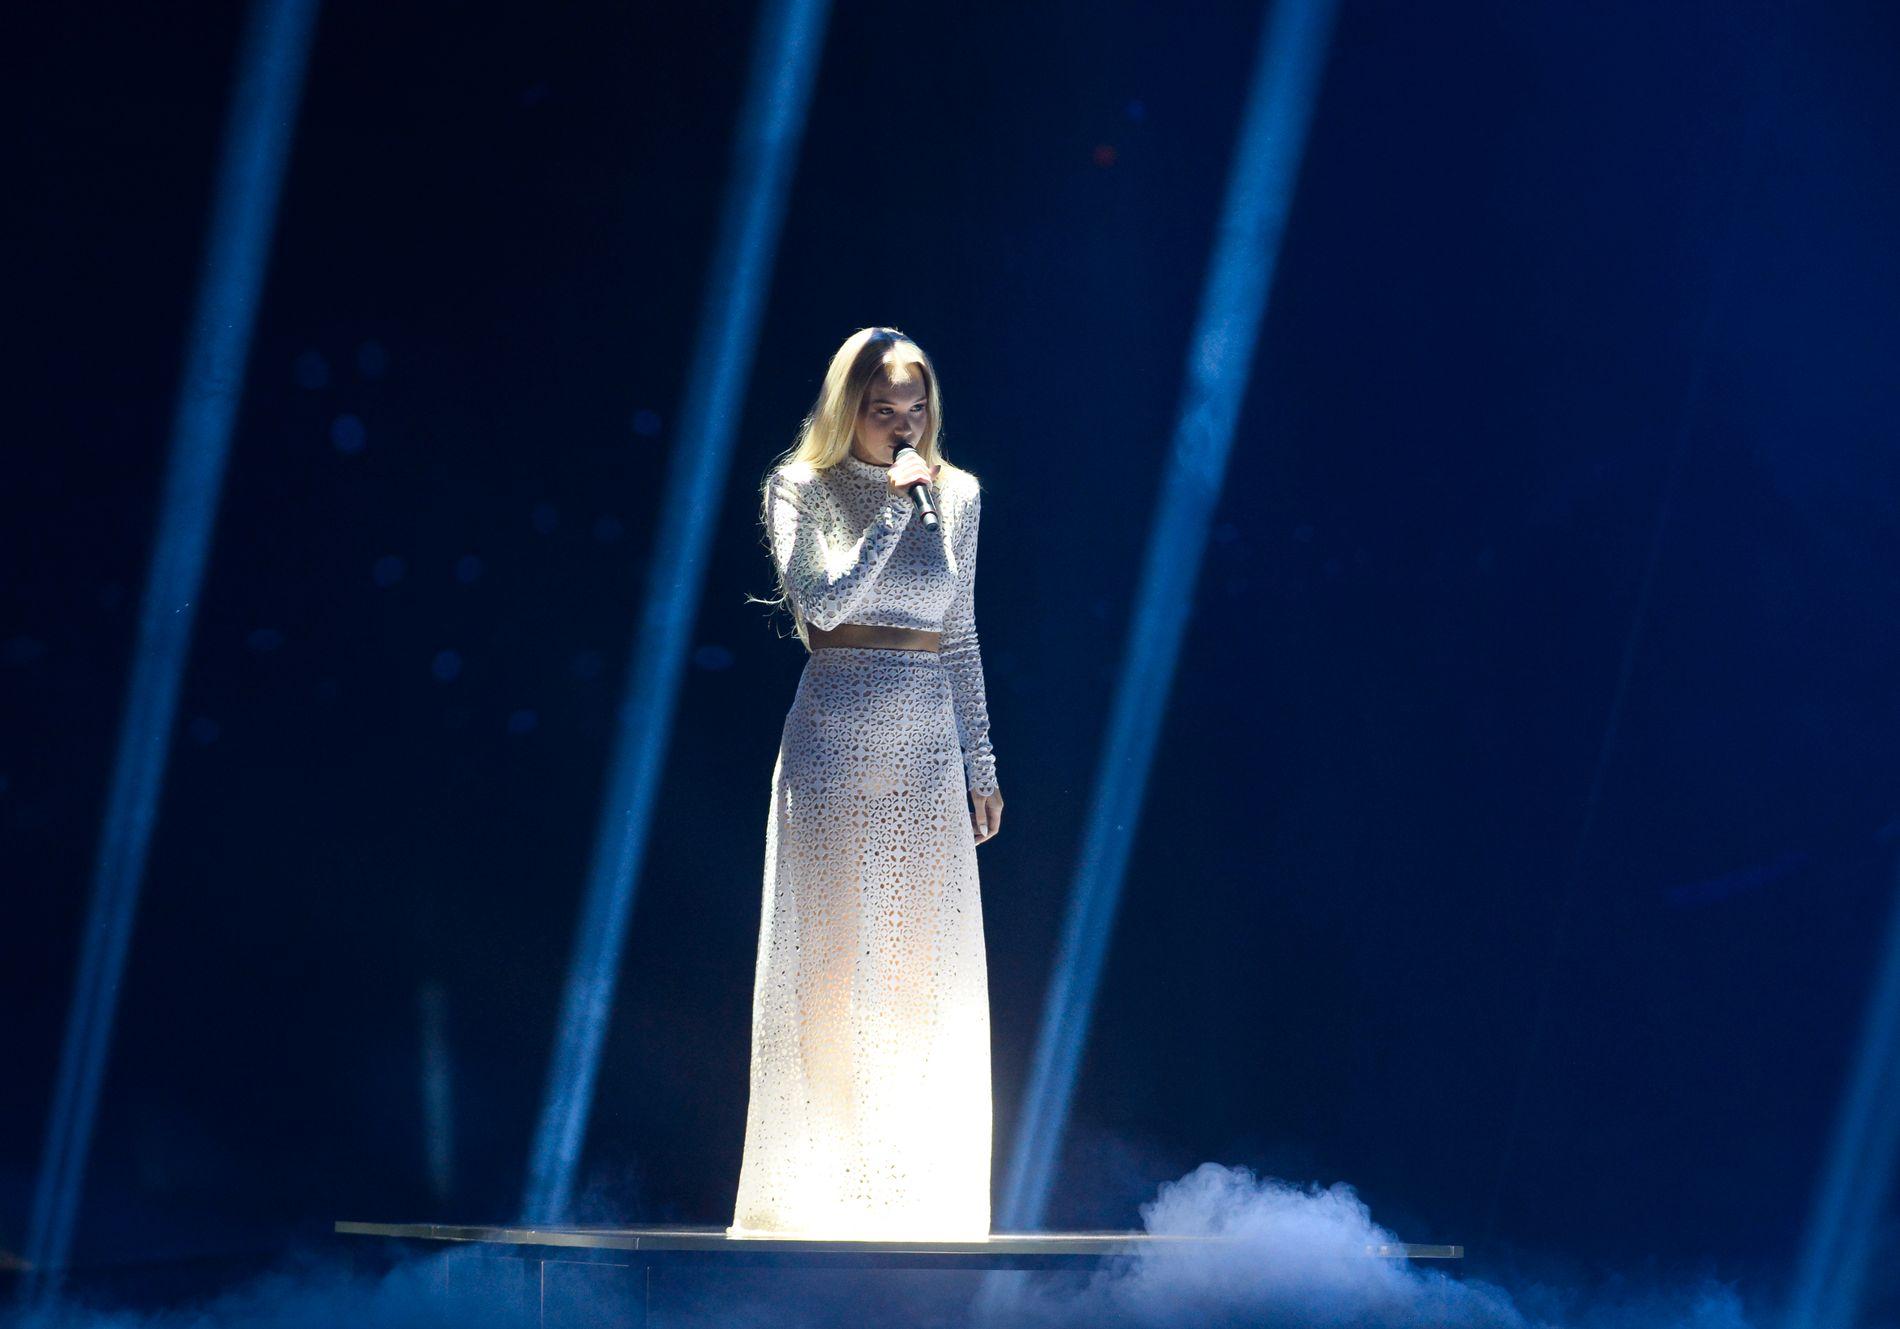 ESC: Norges Agnete framførte bidraget «Icebreaker» under den andre semifinalen under Eurovision Song Contest (ESC) i Globen i Stockholm torsdag kveld.